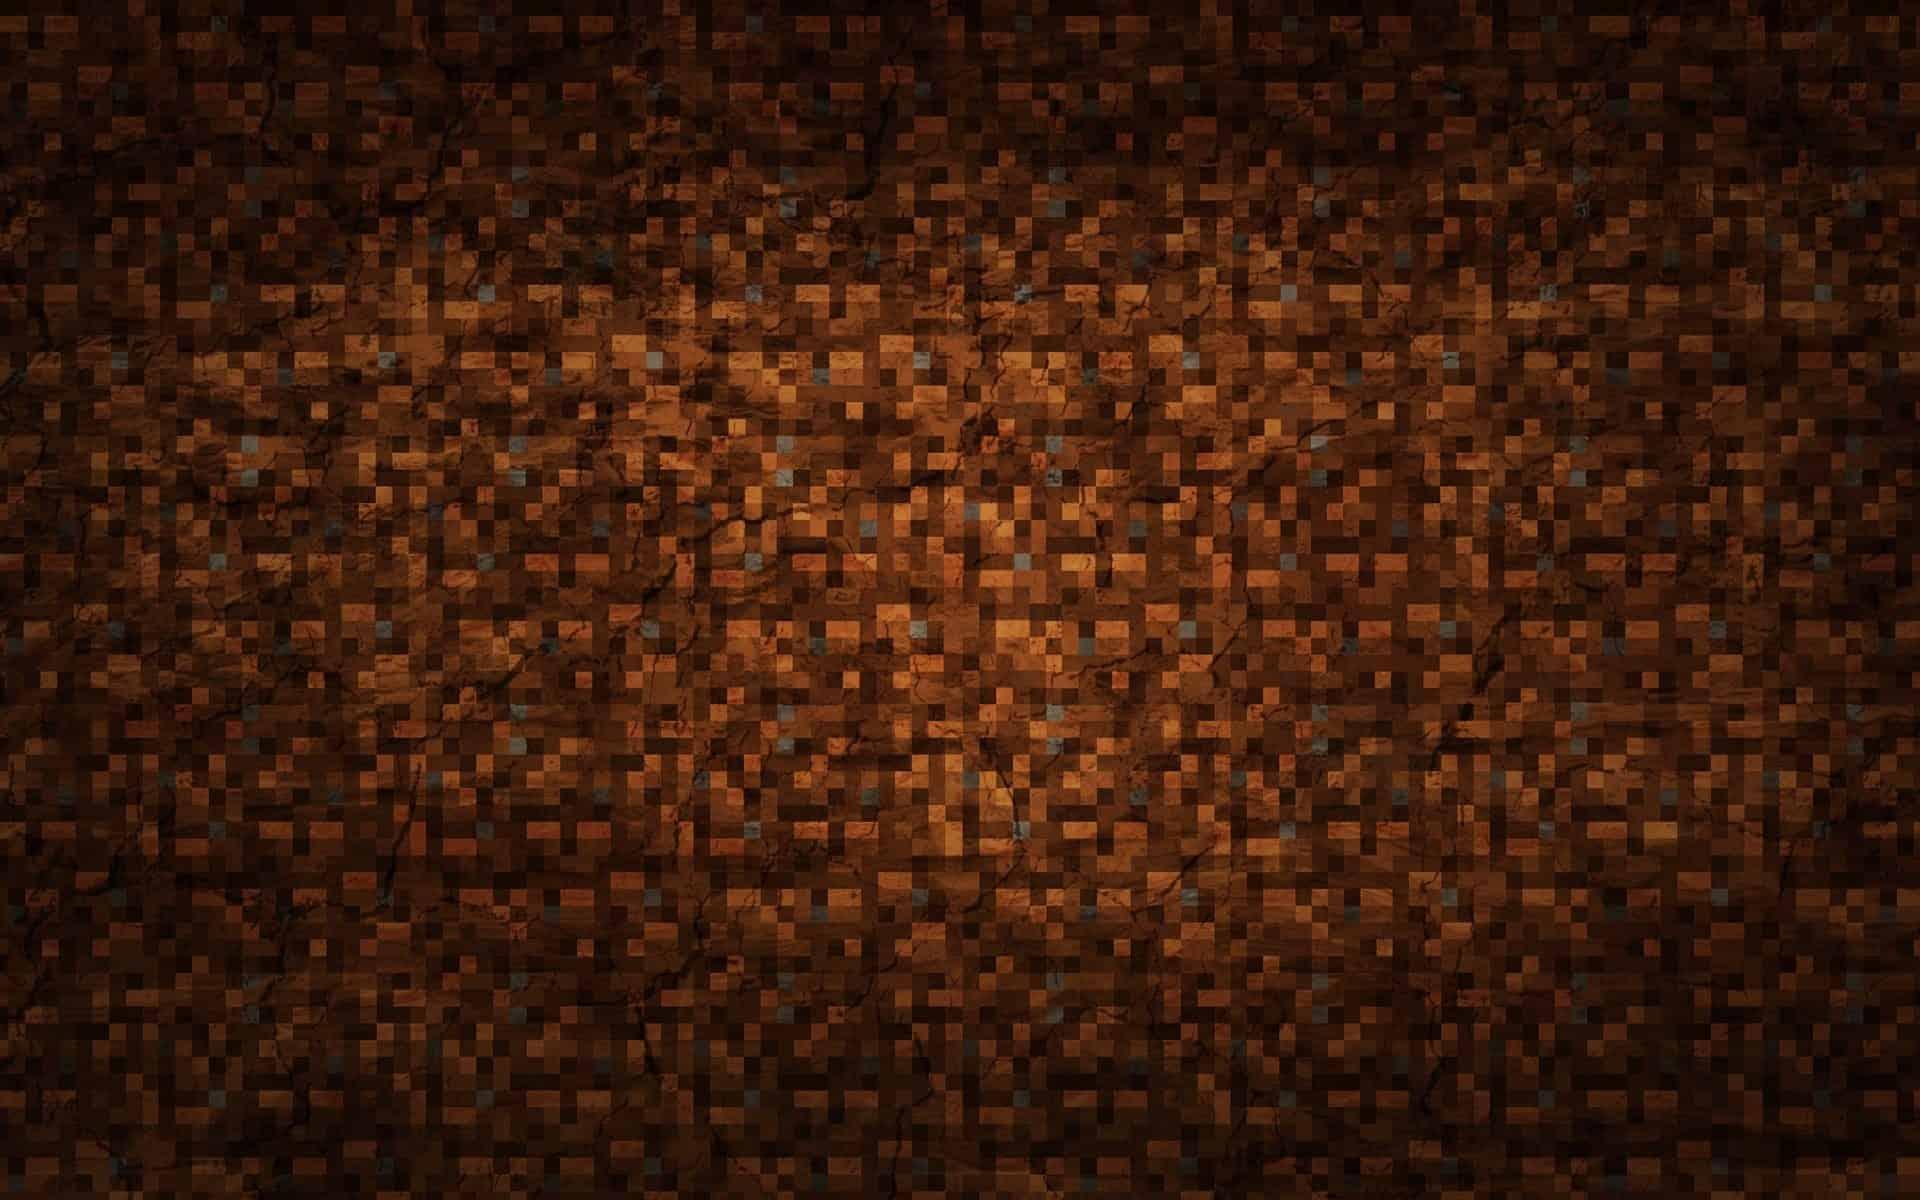 Minecraft 1920x1200px Wallpaper